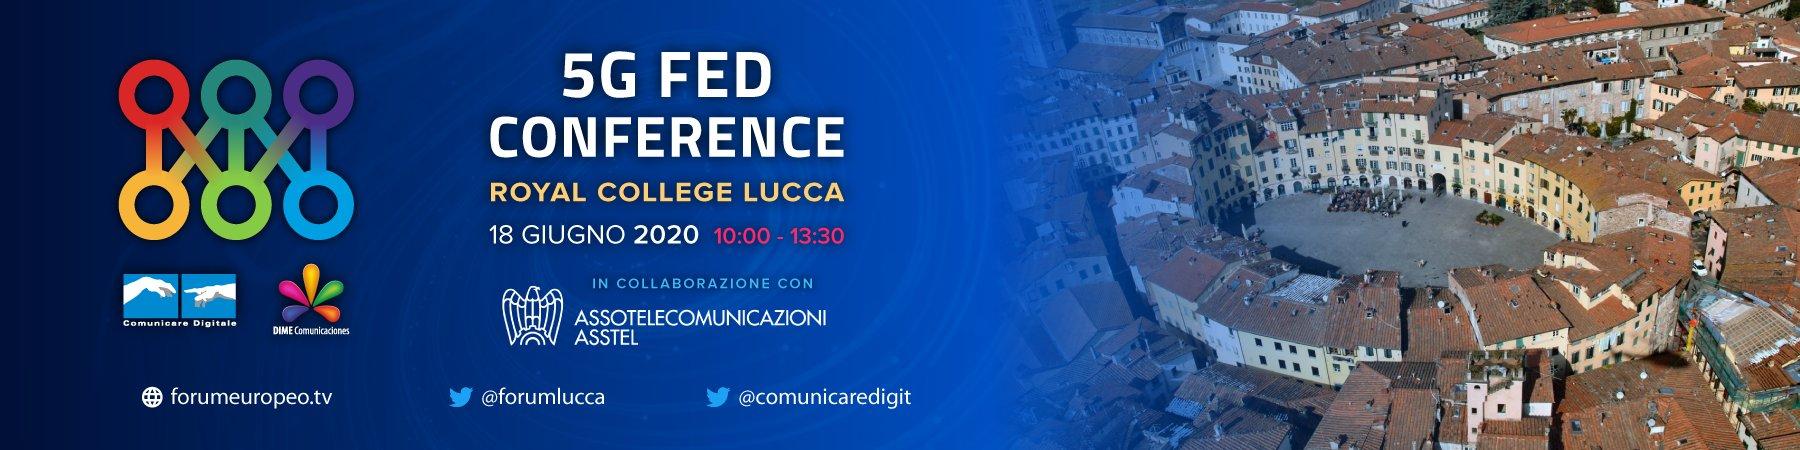 5G FED Conference al 17esimo Forum Europeo Digitale Lucca 2020